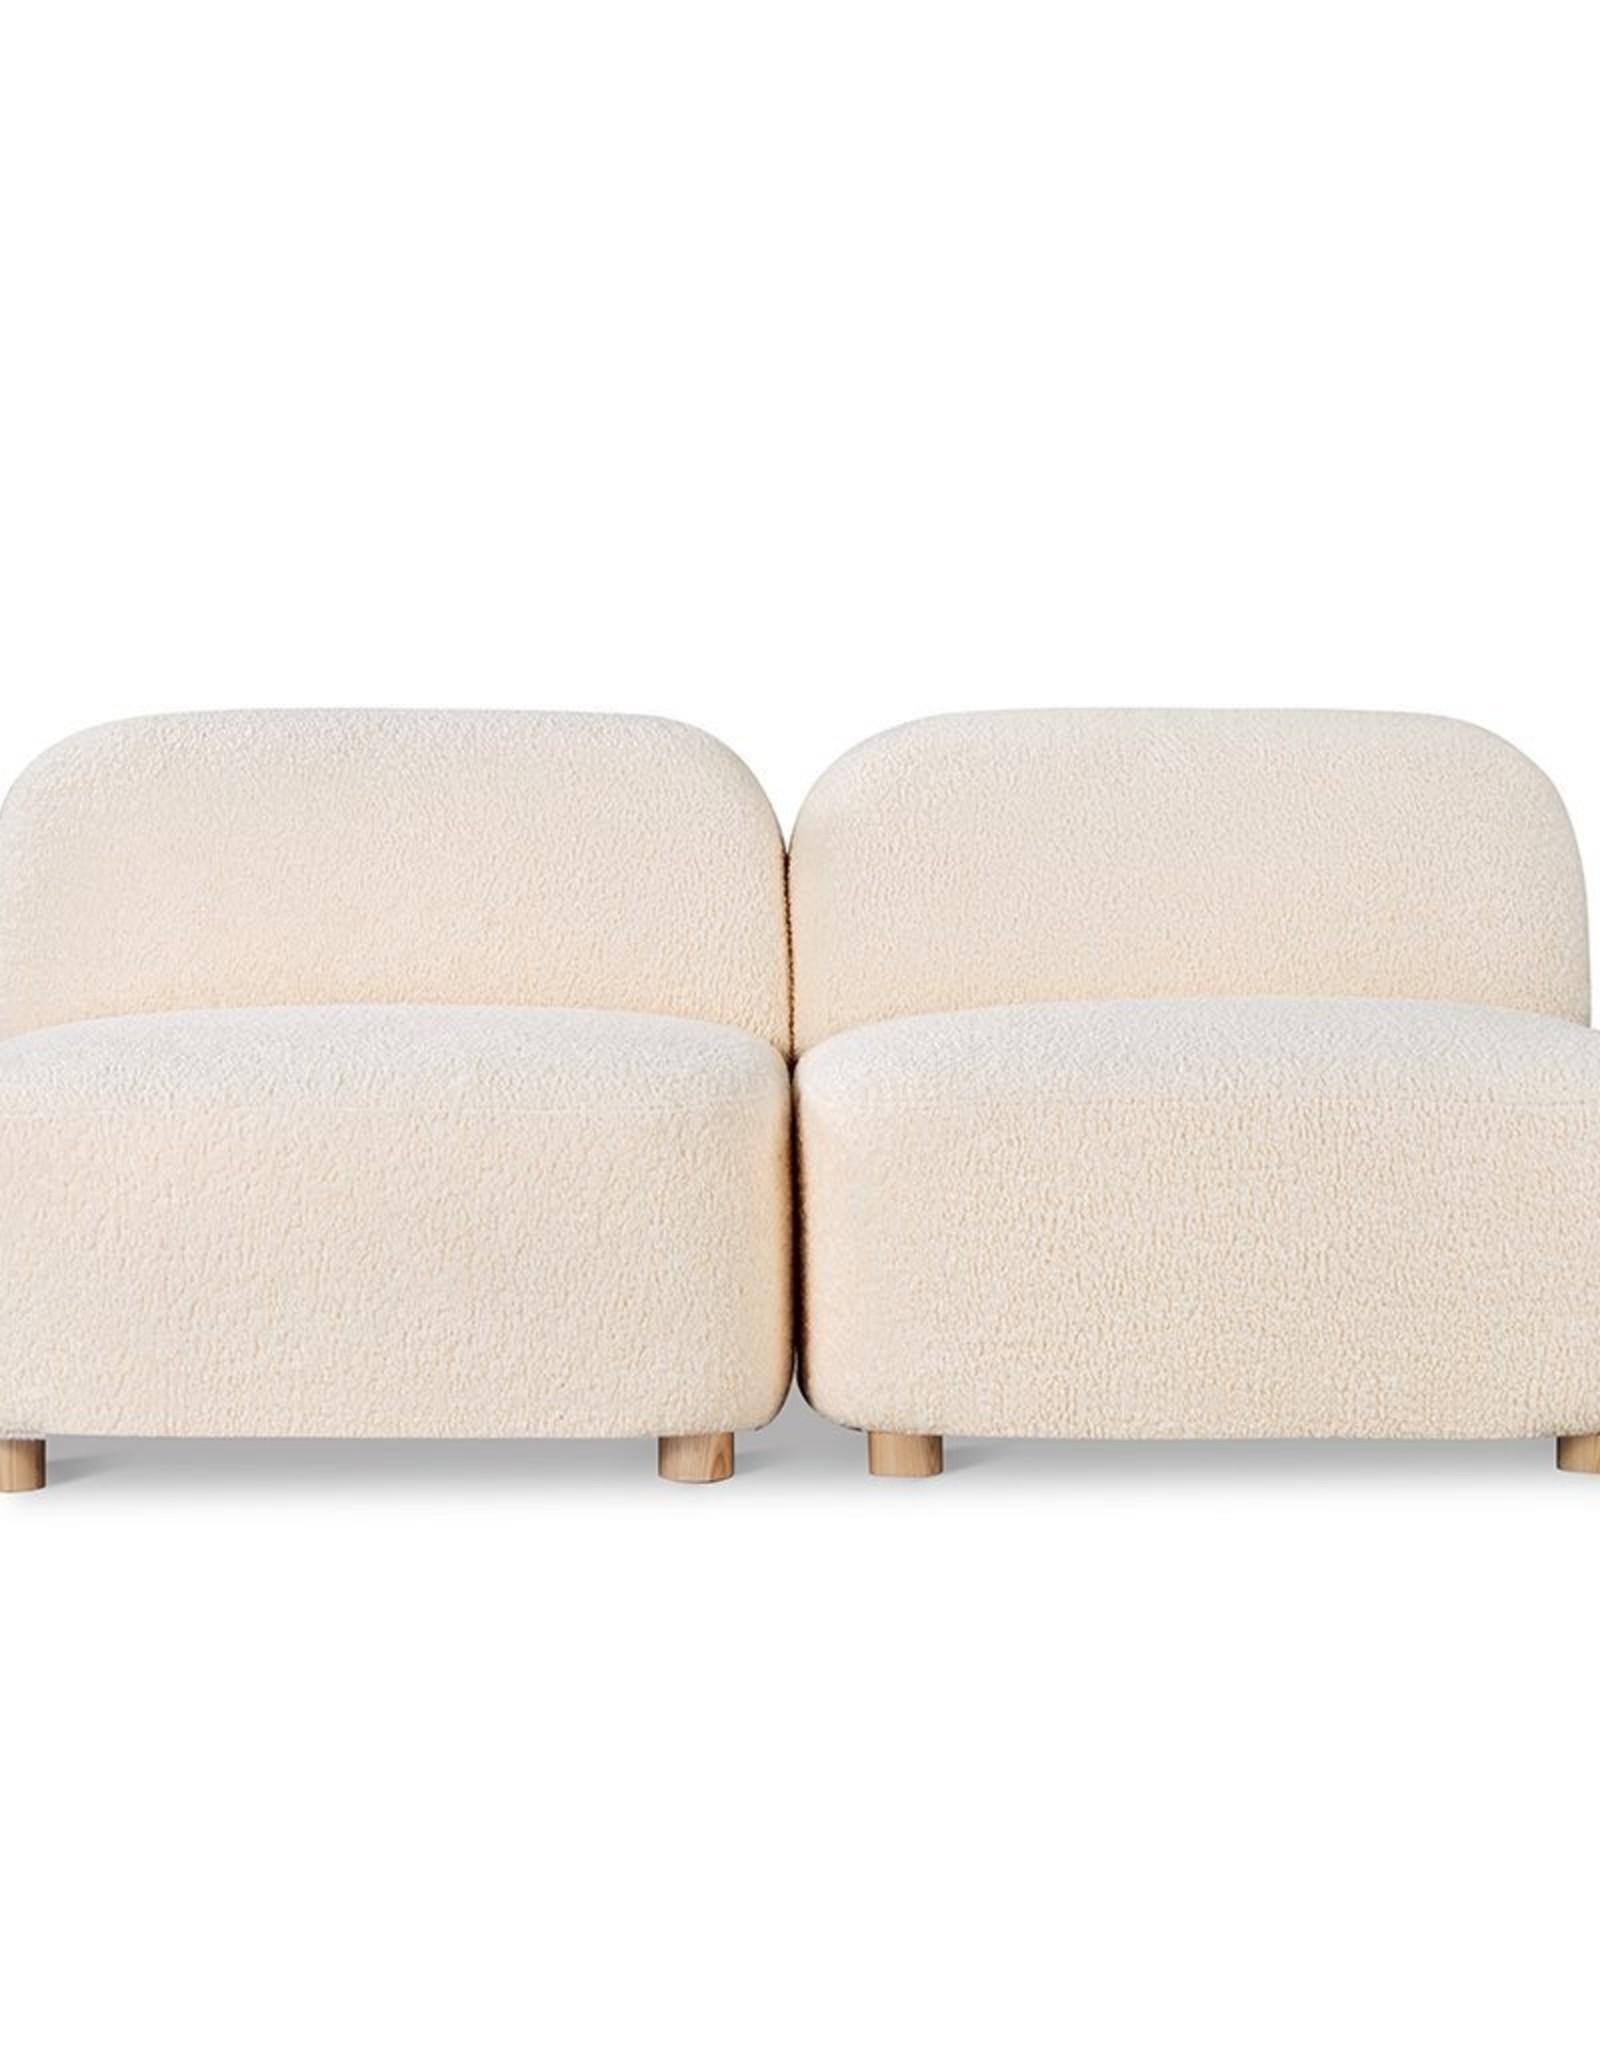 Gus* Modern Circuit Modular 2-Pc Armless Sofa